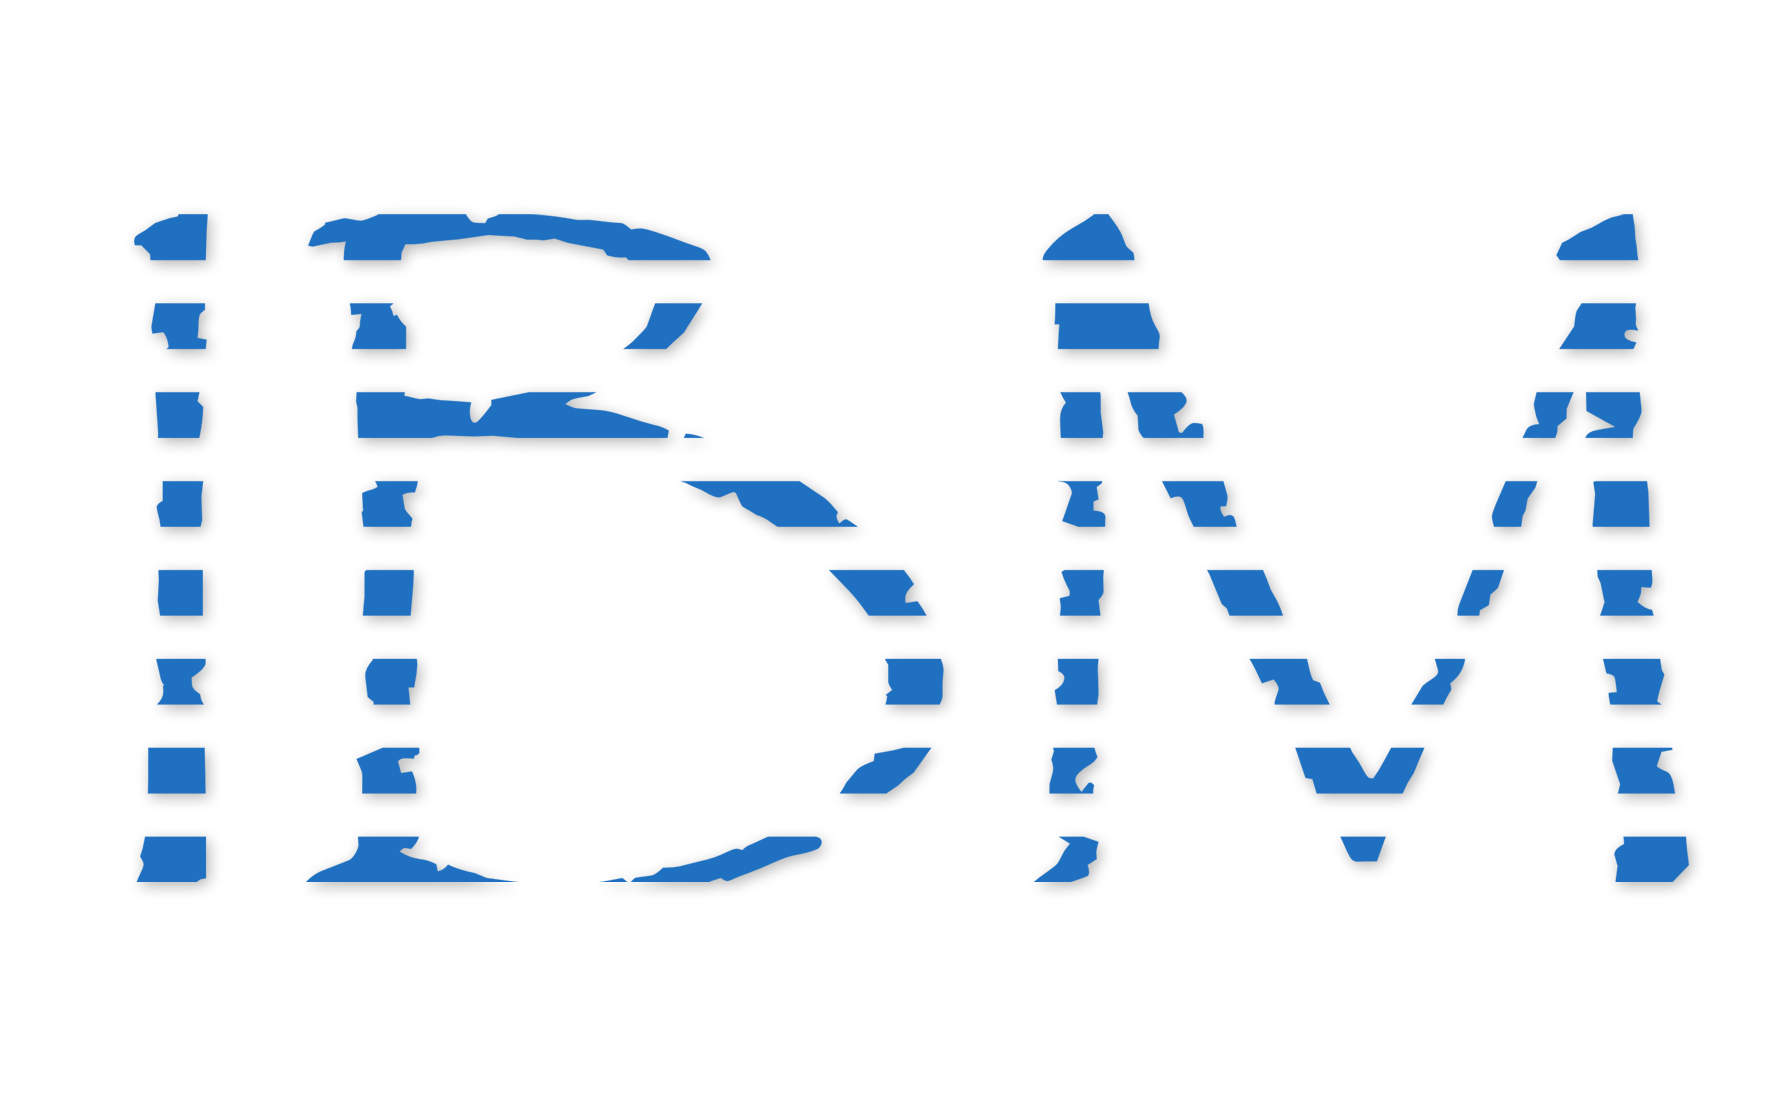 Famous Logos in Papyrus Font — Steve Lovelace